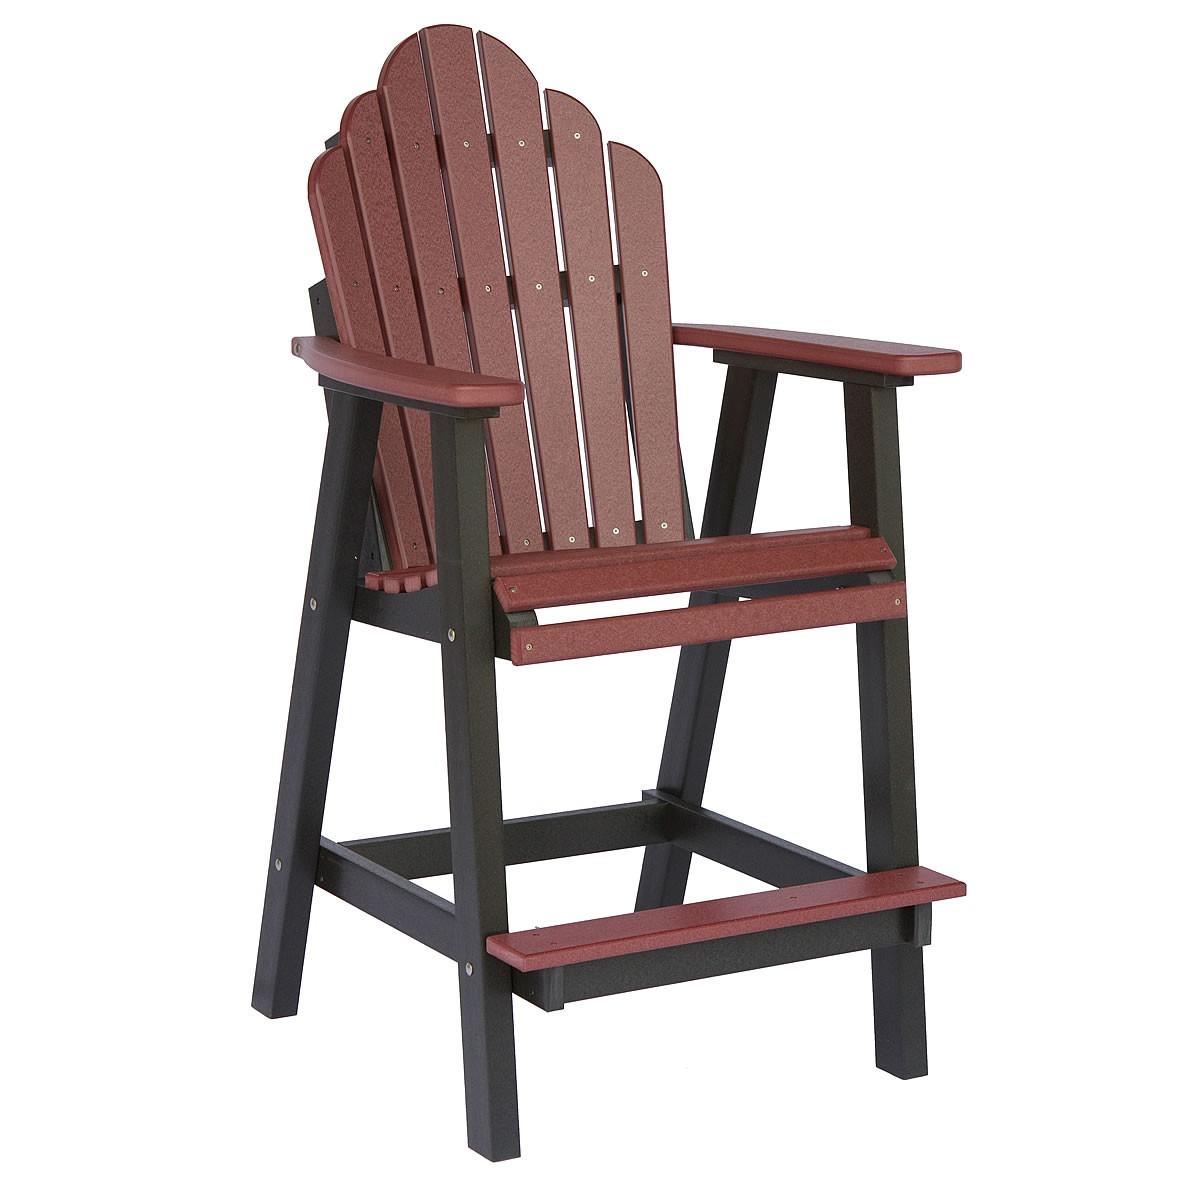 berlin gardens cozi back bar chair. Black Bedroom Furniture Sets. Home Design Ideas